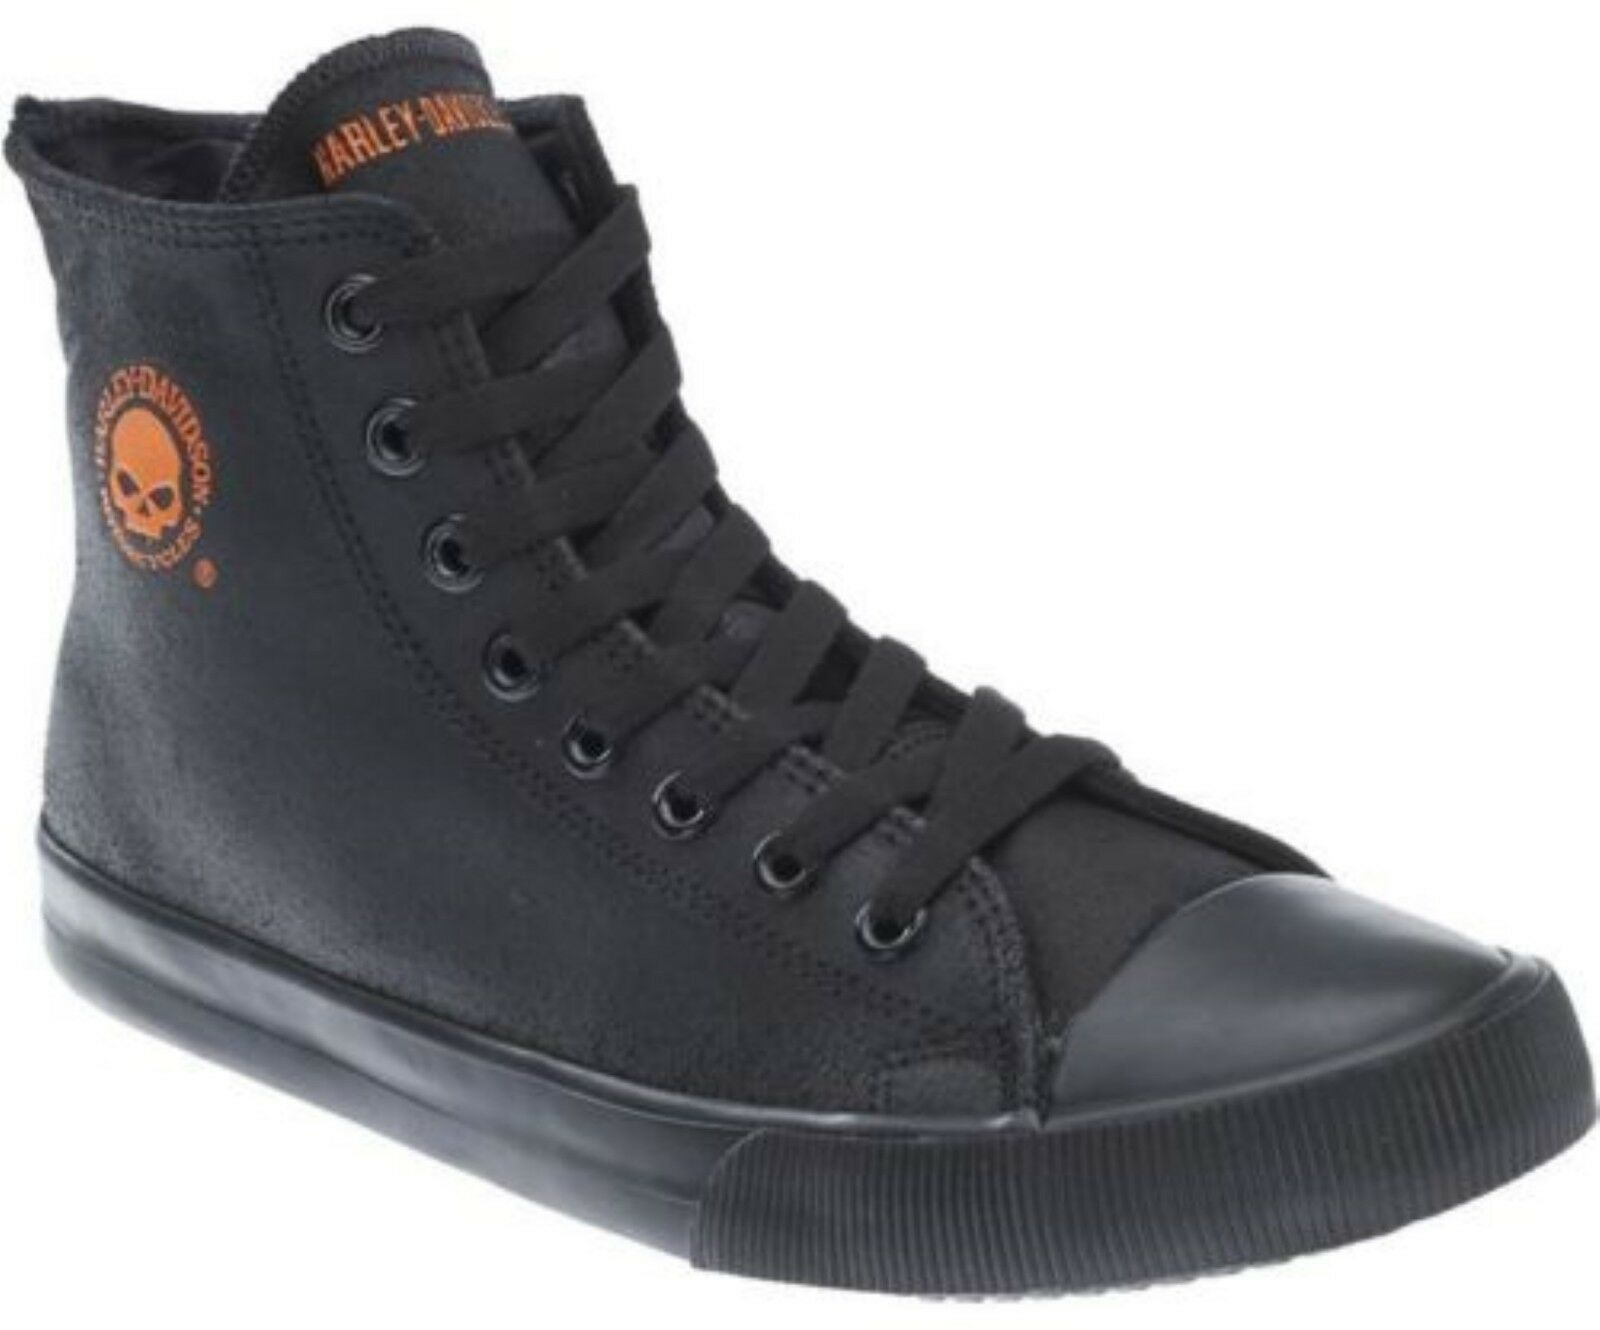 Harley Davidson Baxter Biker Men Schuhes High Top Sneaker schwarz Orange Leder